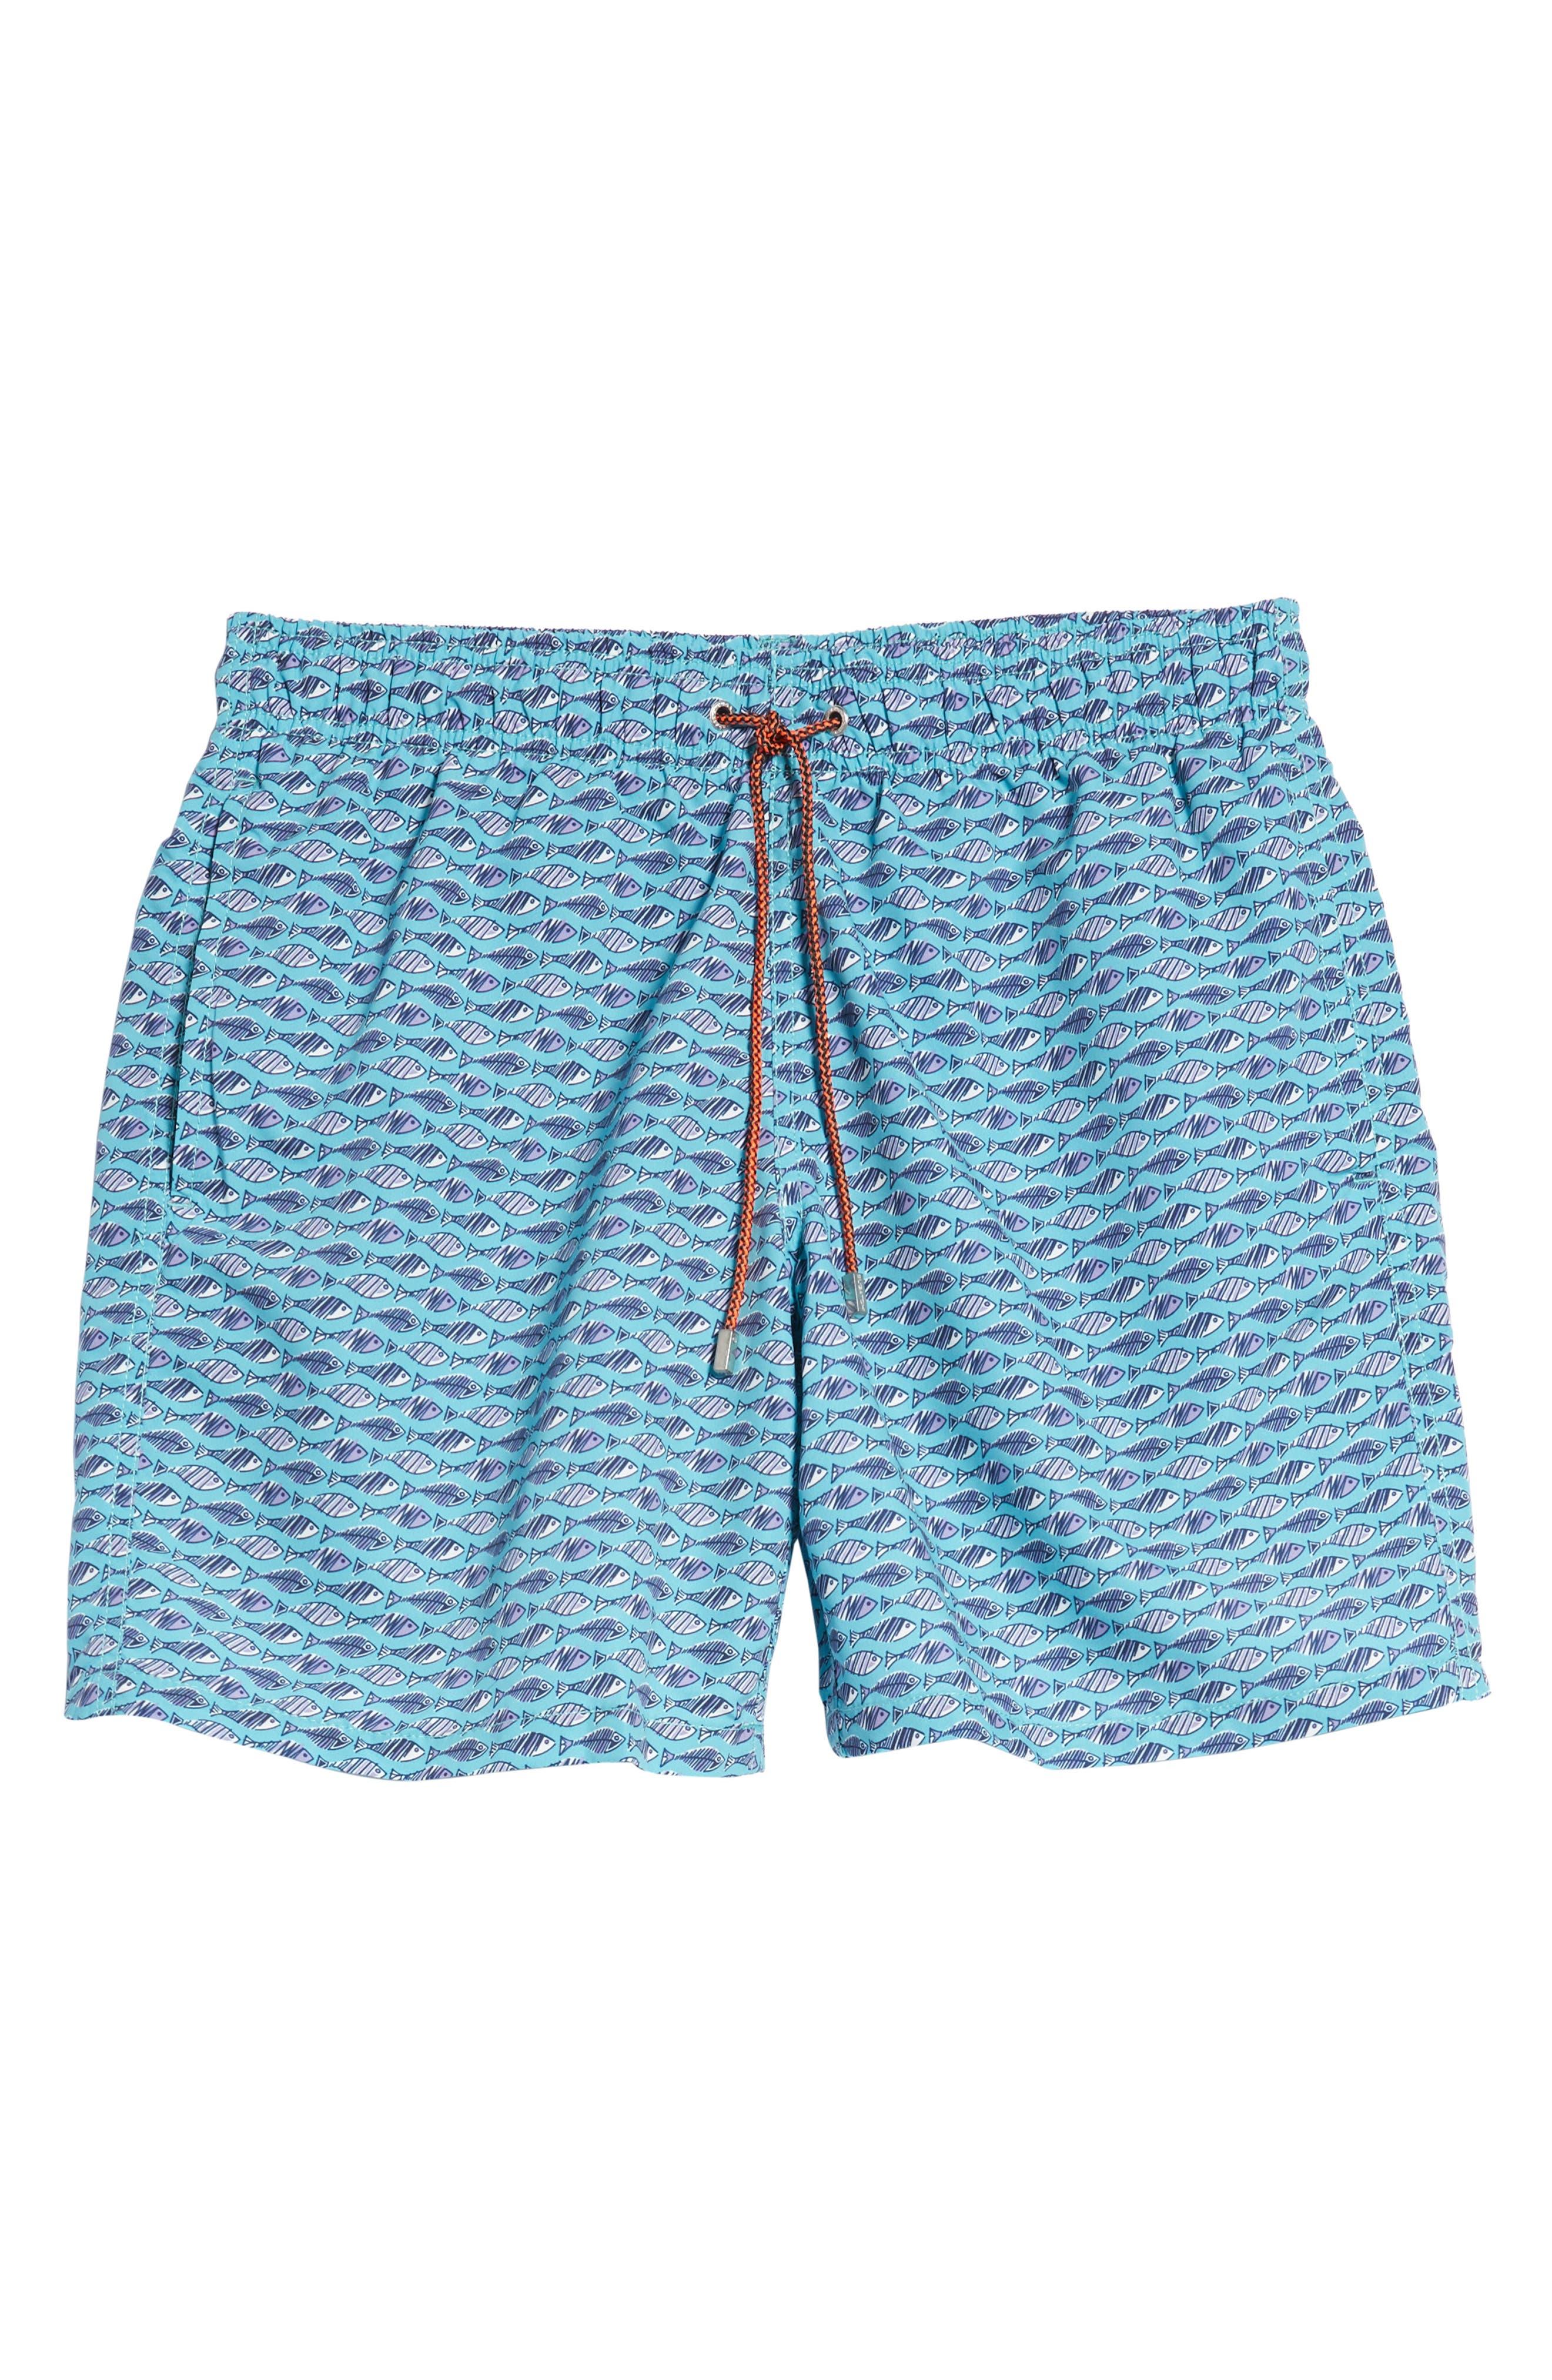 Swim Trunks,                             Alternate thumbnail 6, color,                             Turquoise